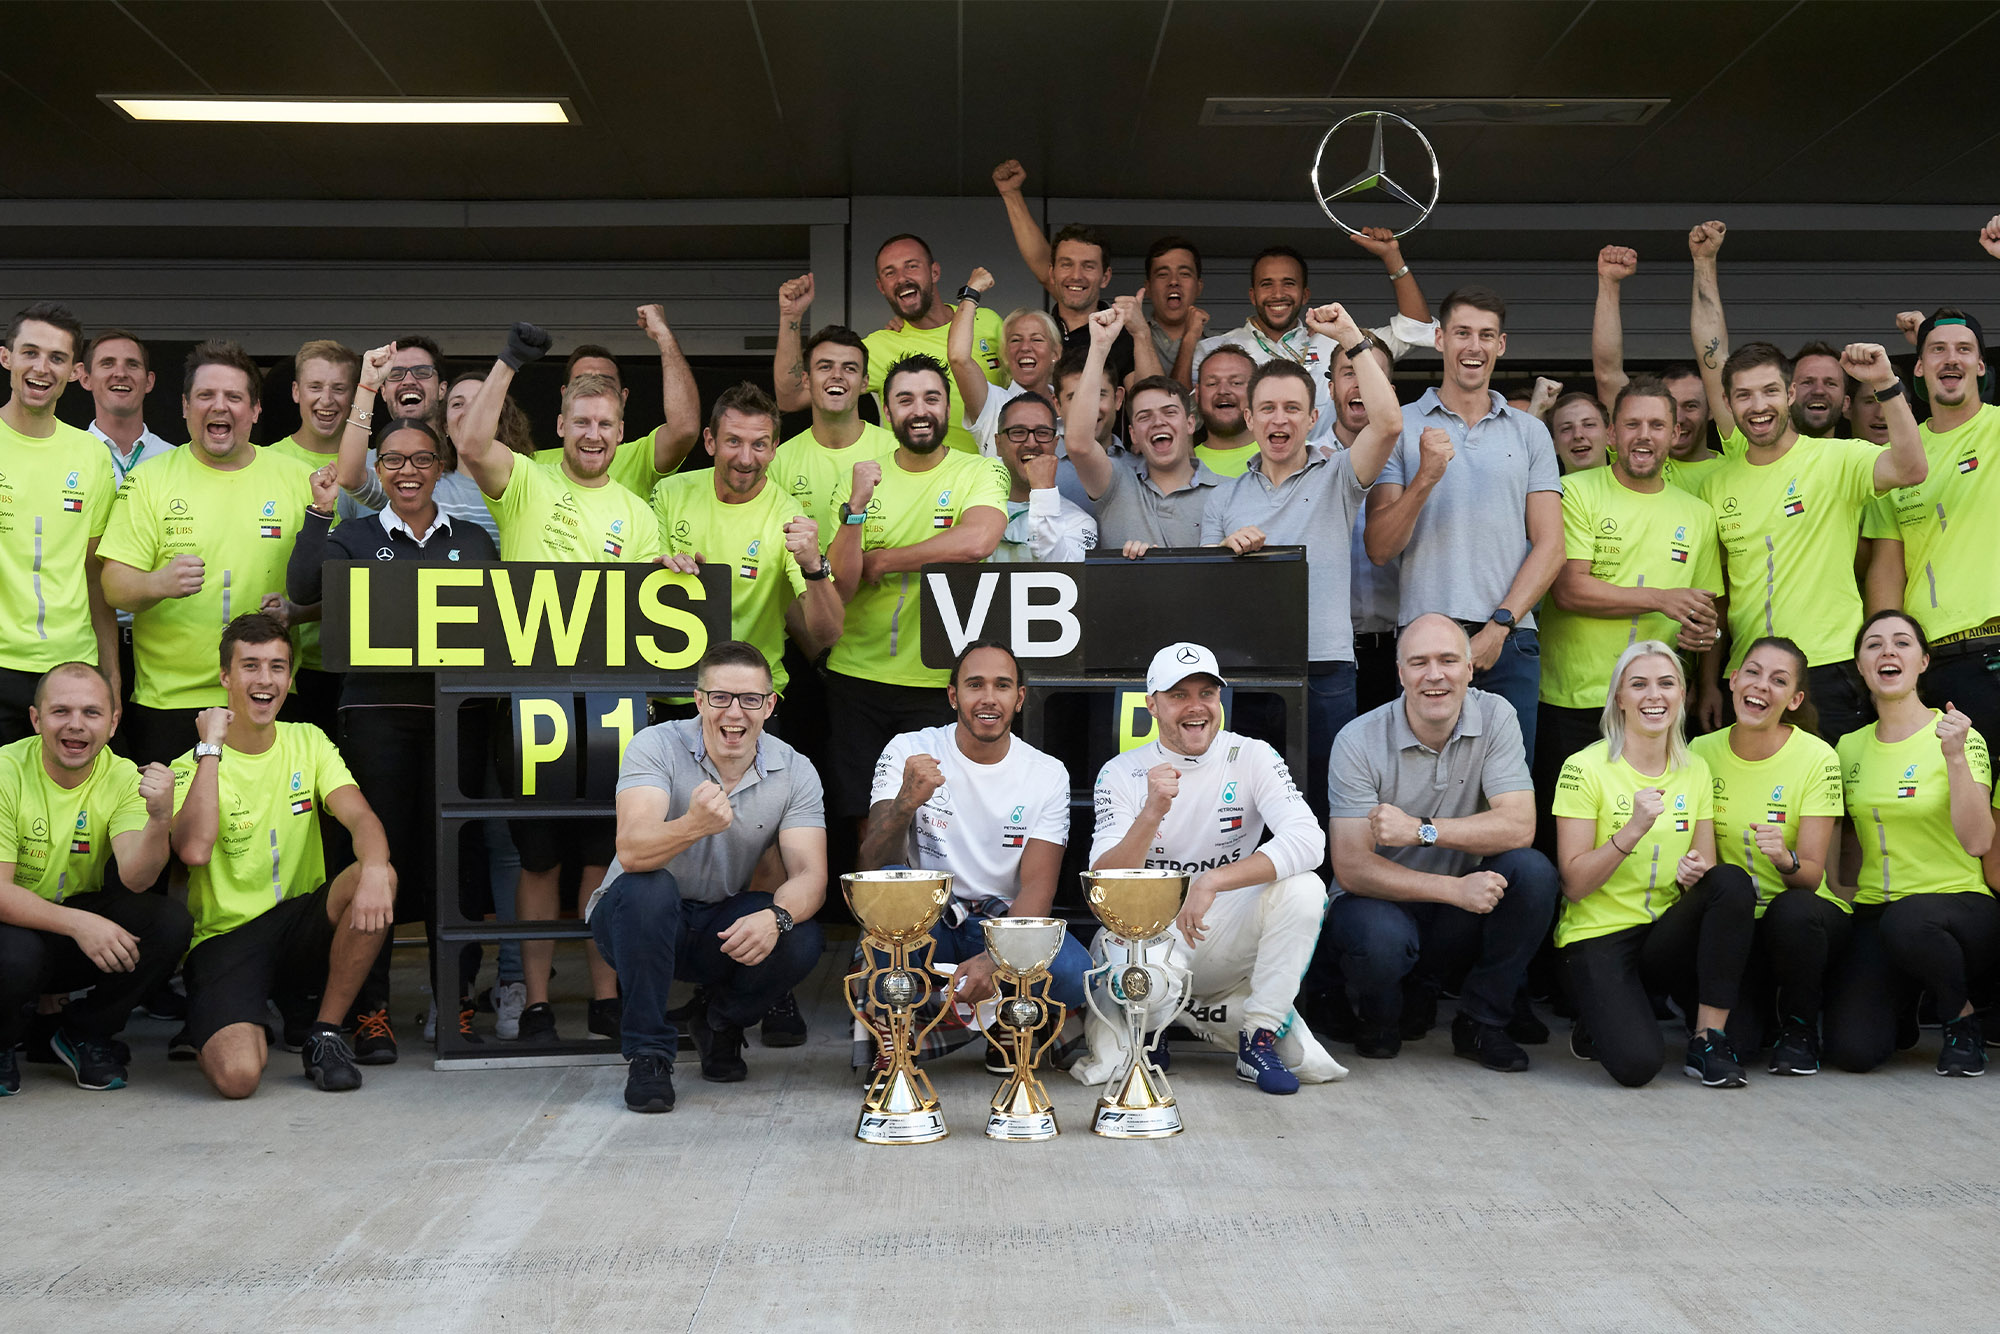 Mercedes celebrate victory at the 2019 Russian Grand Prix